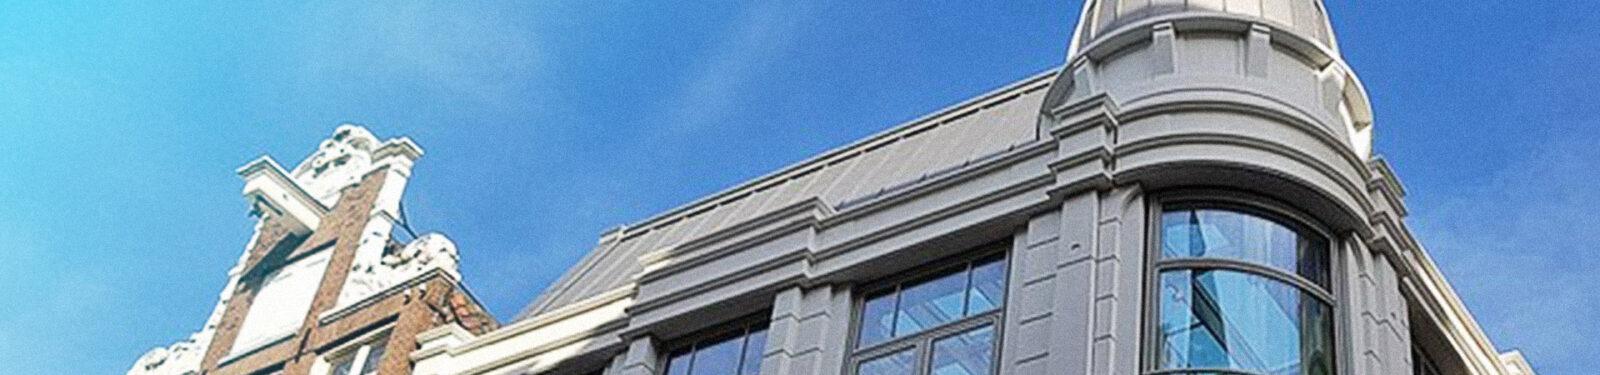 acrylic-one-fasada-kalverstraat